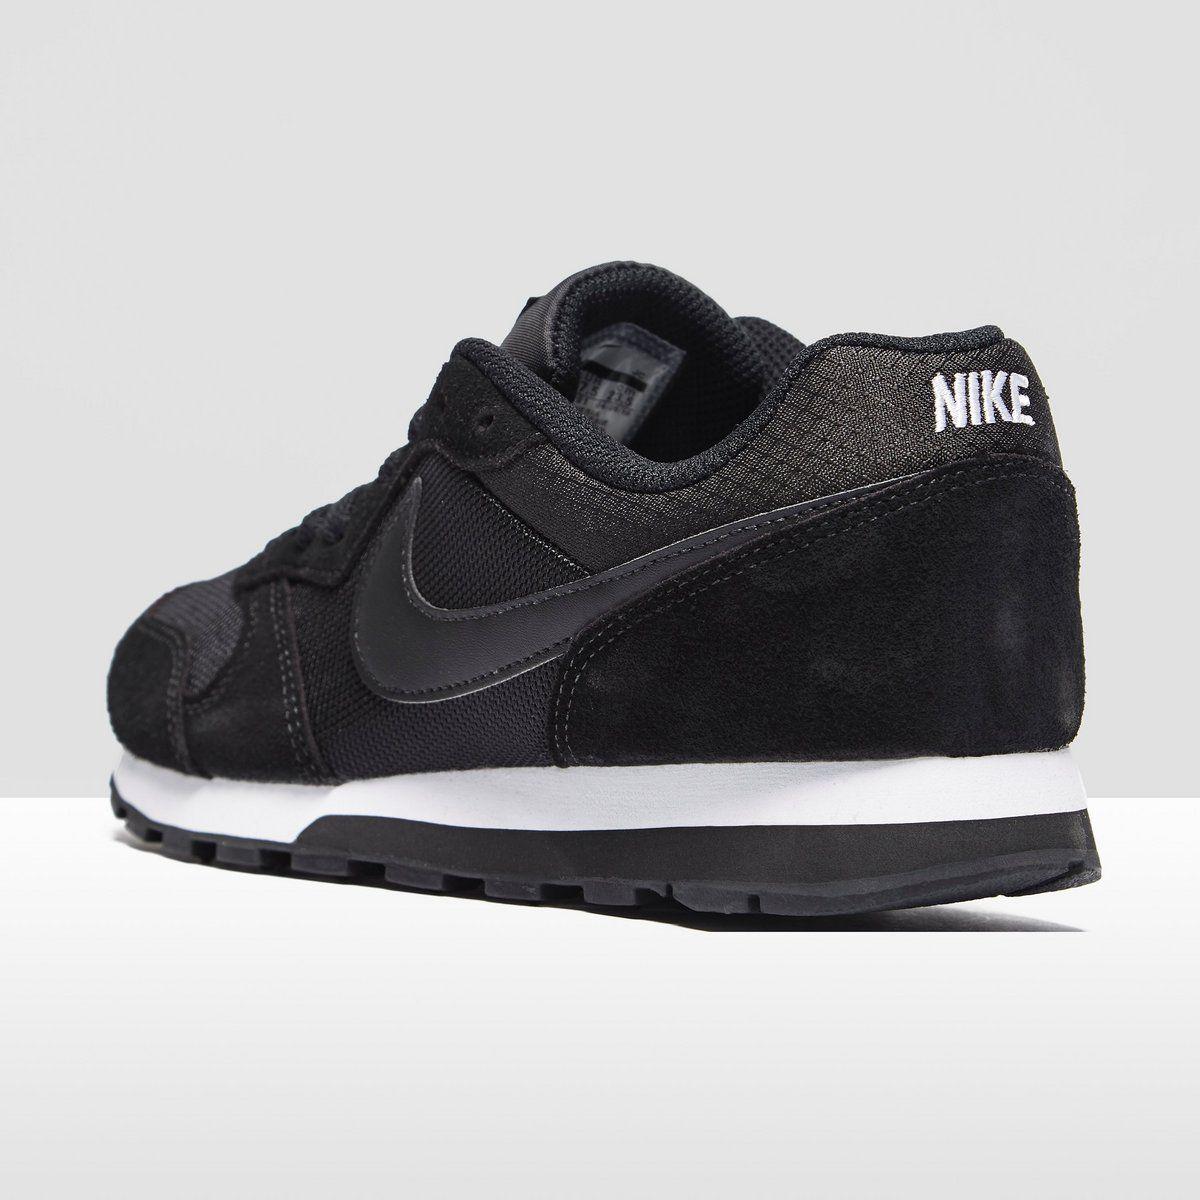 Nike MD RUNNER 2 | Schoenen, Zwart, Sneaker